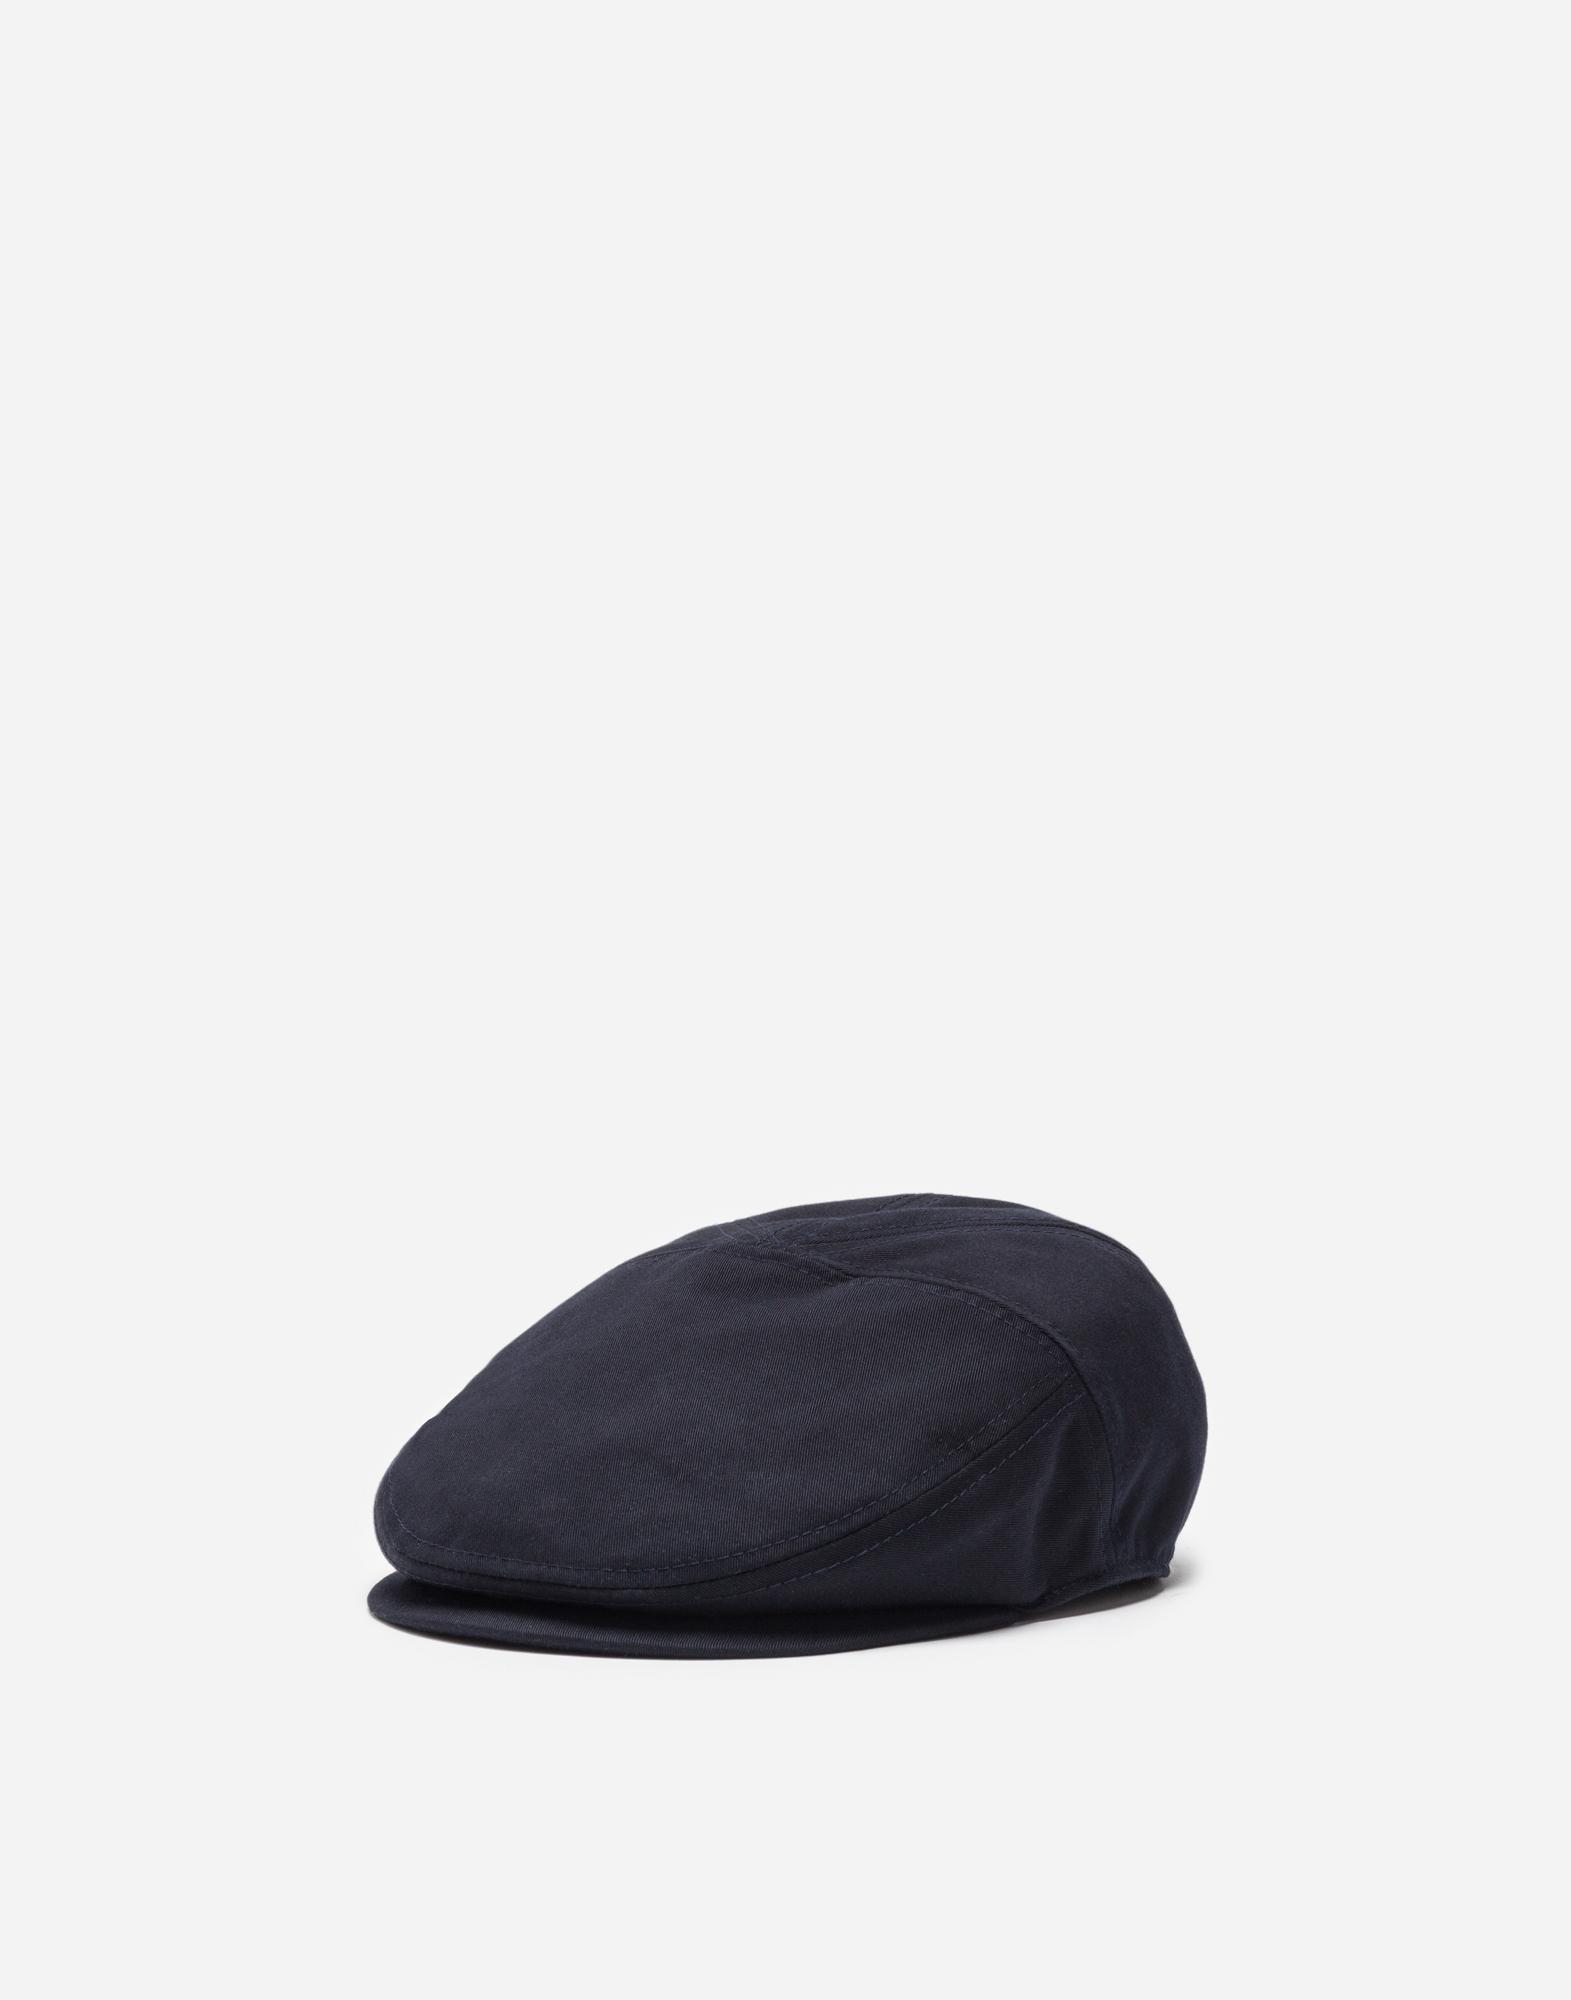 Dolce&Gabbana FLAT CAP IN COTTON